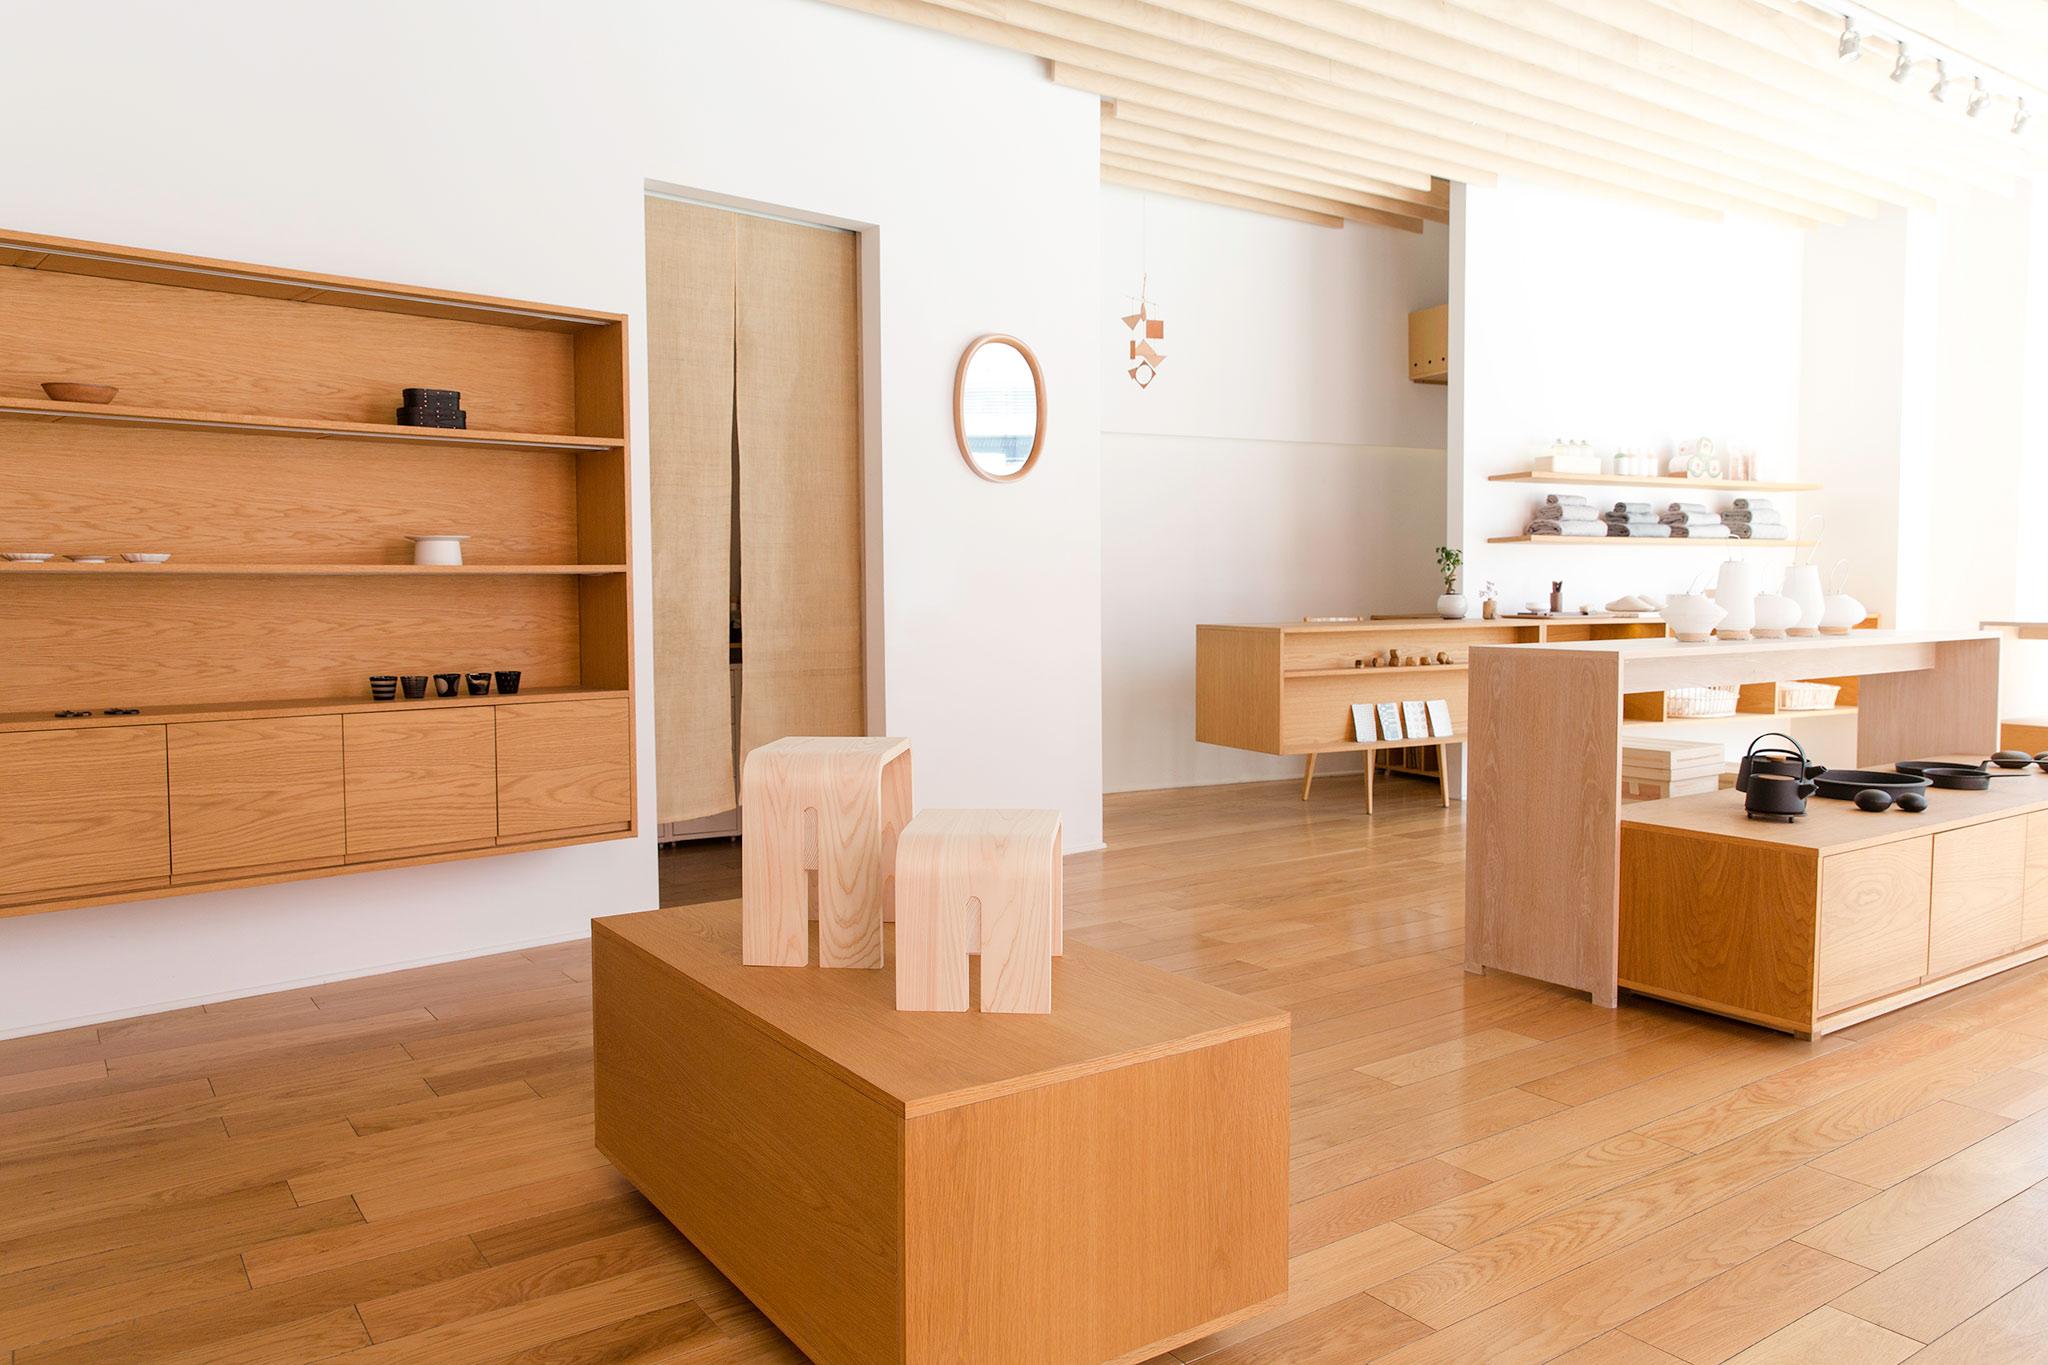 agencement magasins spécialiste Piriac-sur-Mer 44